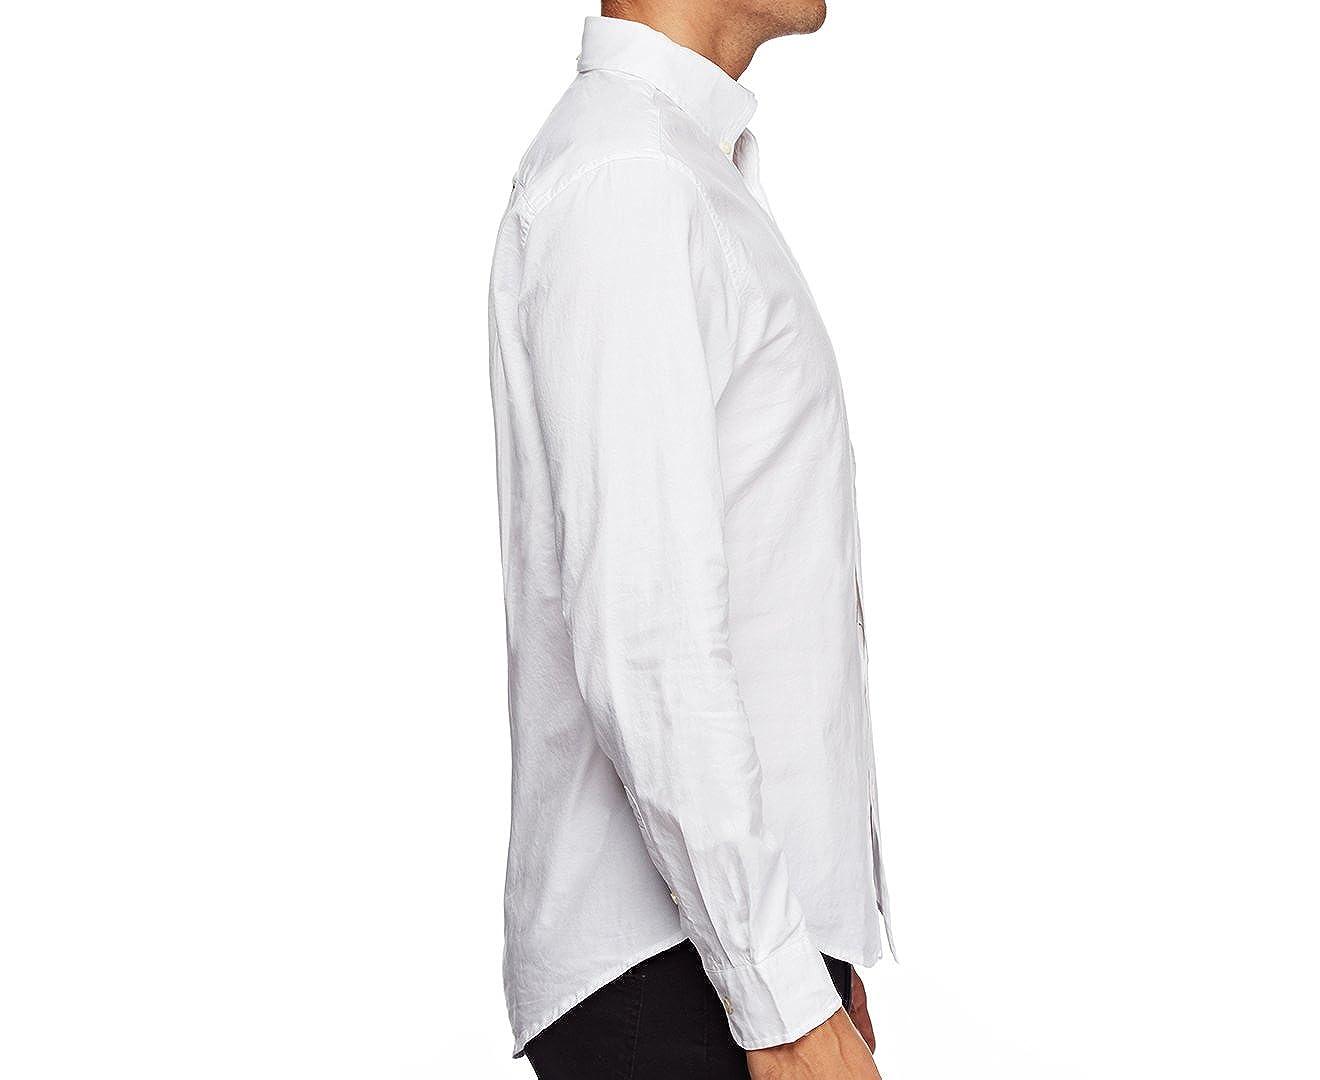 Tommy Hilfiger Mens Custom Fit Long Sleeve Buttondown Shirt